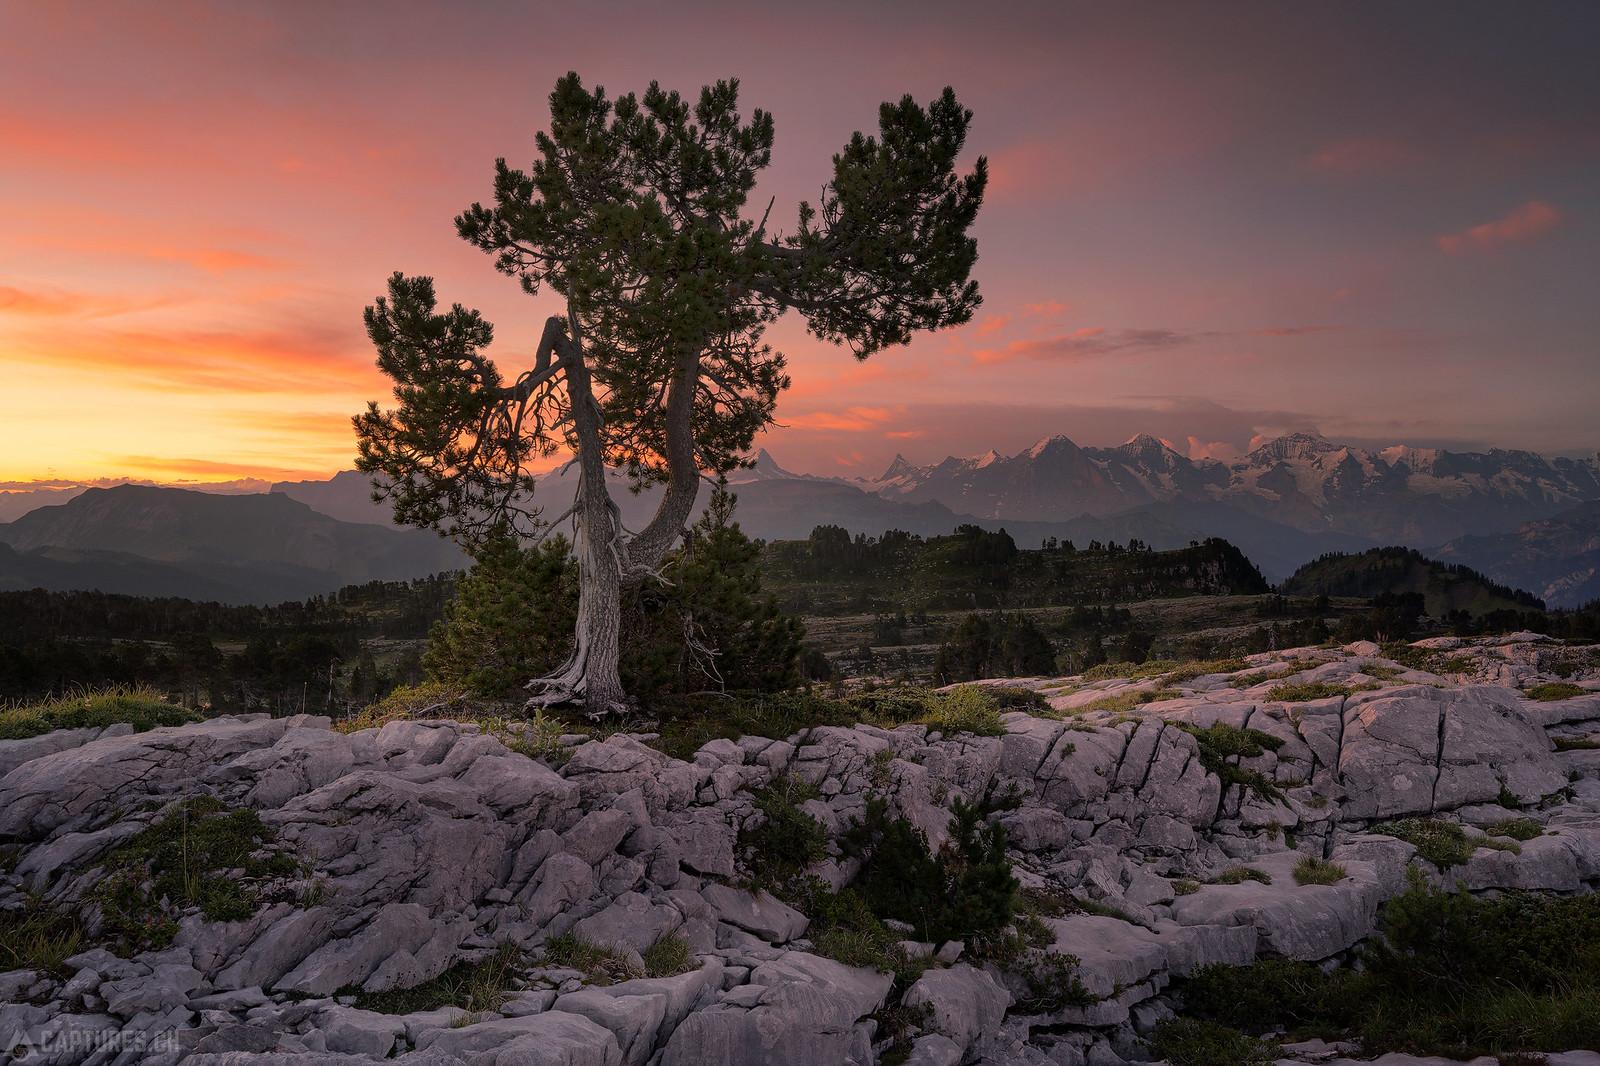 Tree in the sunrise light - Seefeld